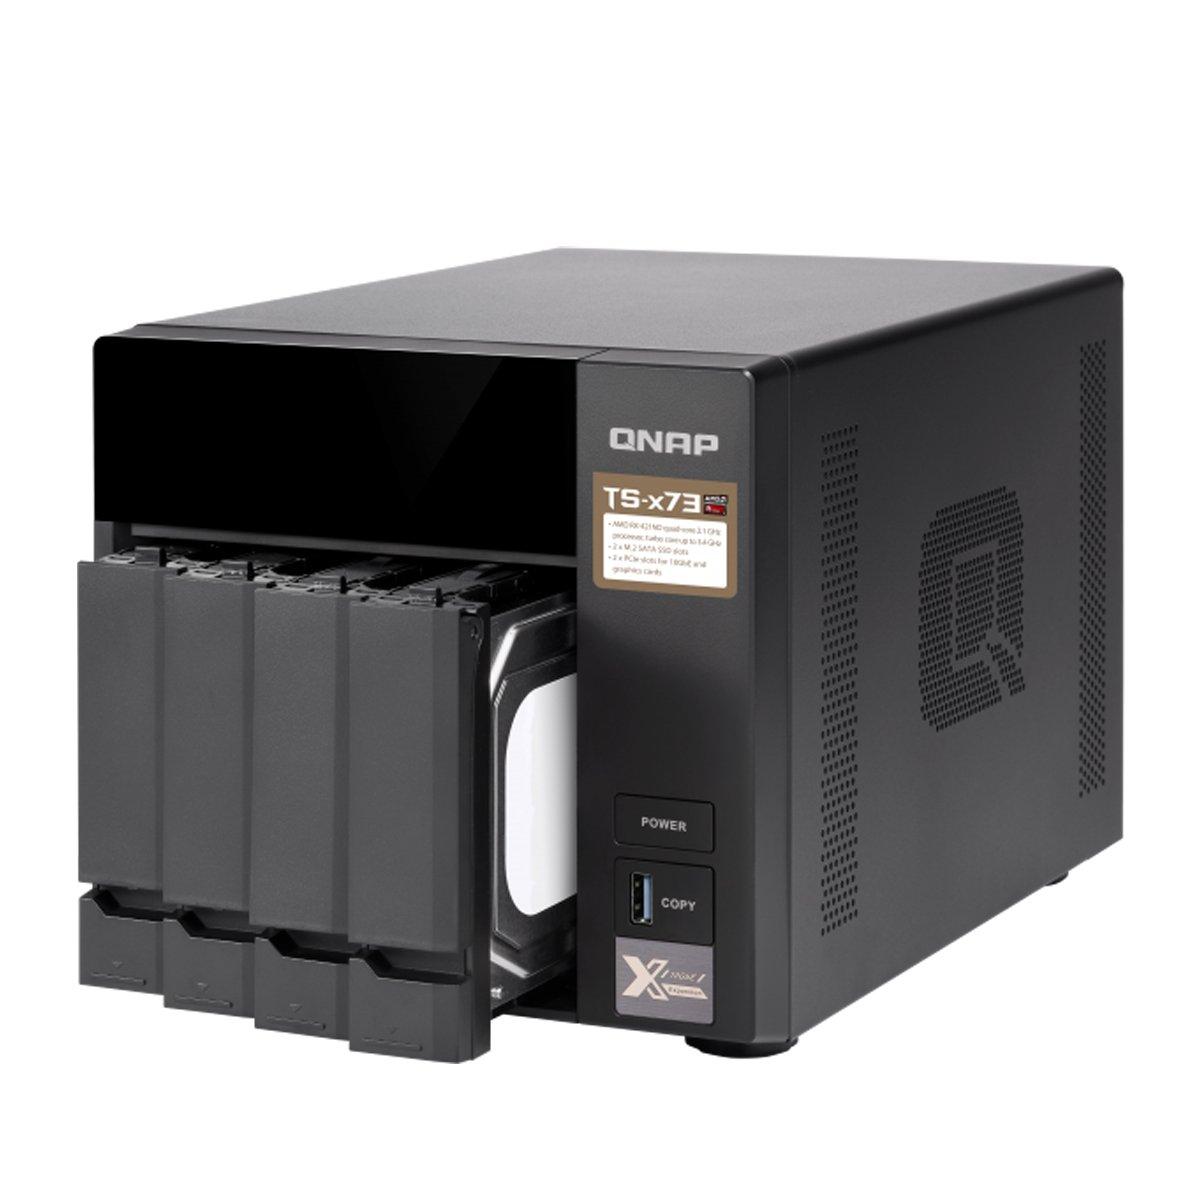 Amazon.com: QNAP TS-873-4G-US 8-Bay NAS/iSCSI IP-SAN, AMD R Series Quad-core 2.1GHz, 4GB RAM, 10G-Ready: Computers & Accessories